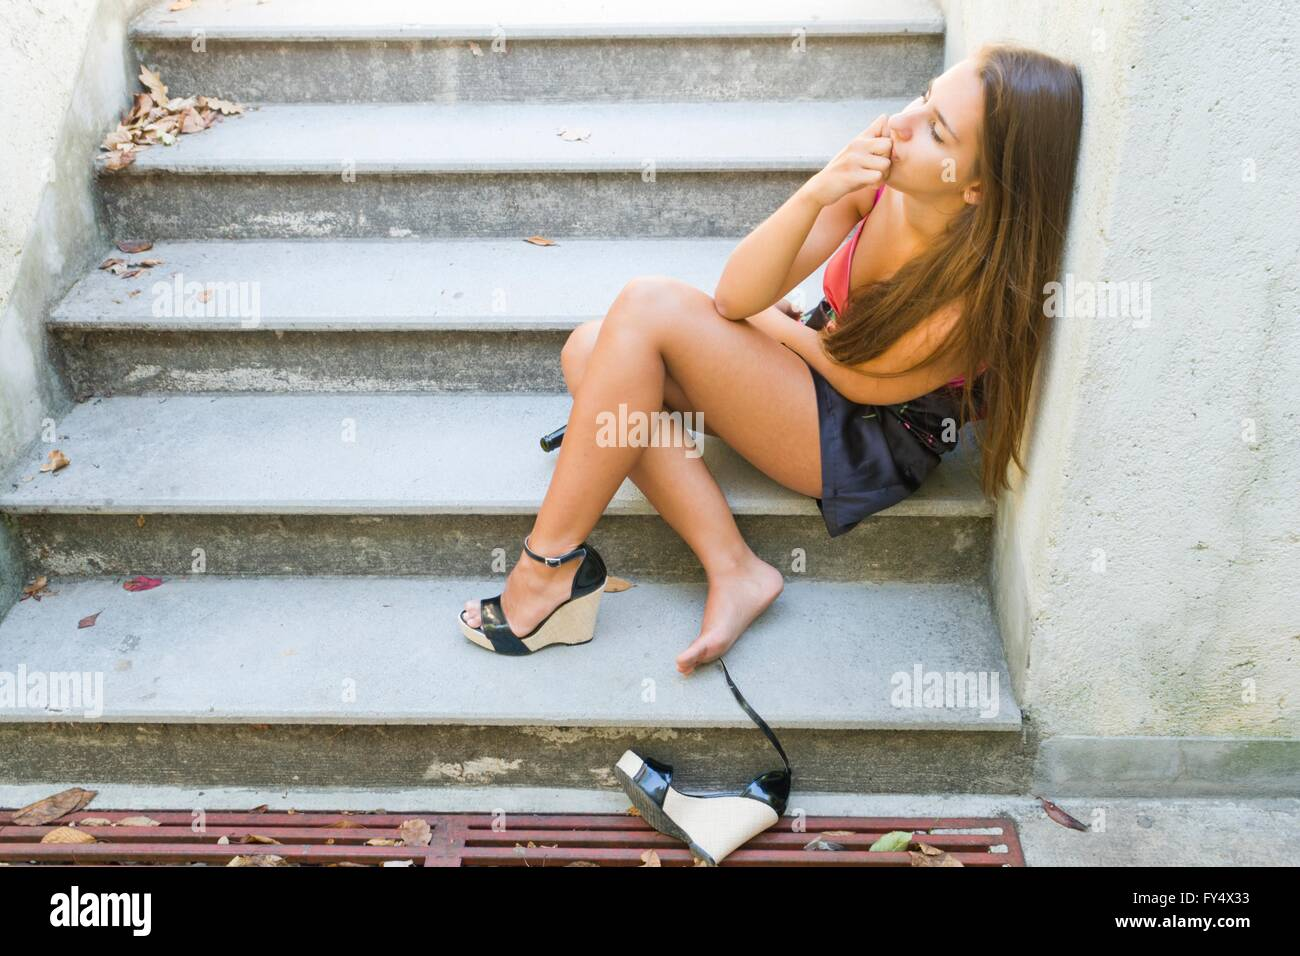 Drunk Girl Feet Images